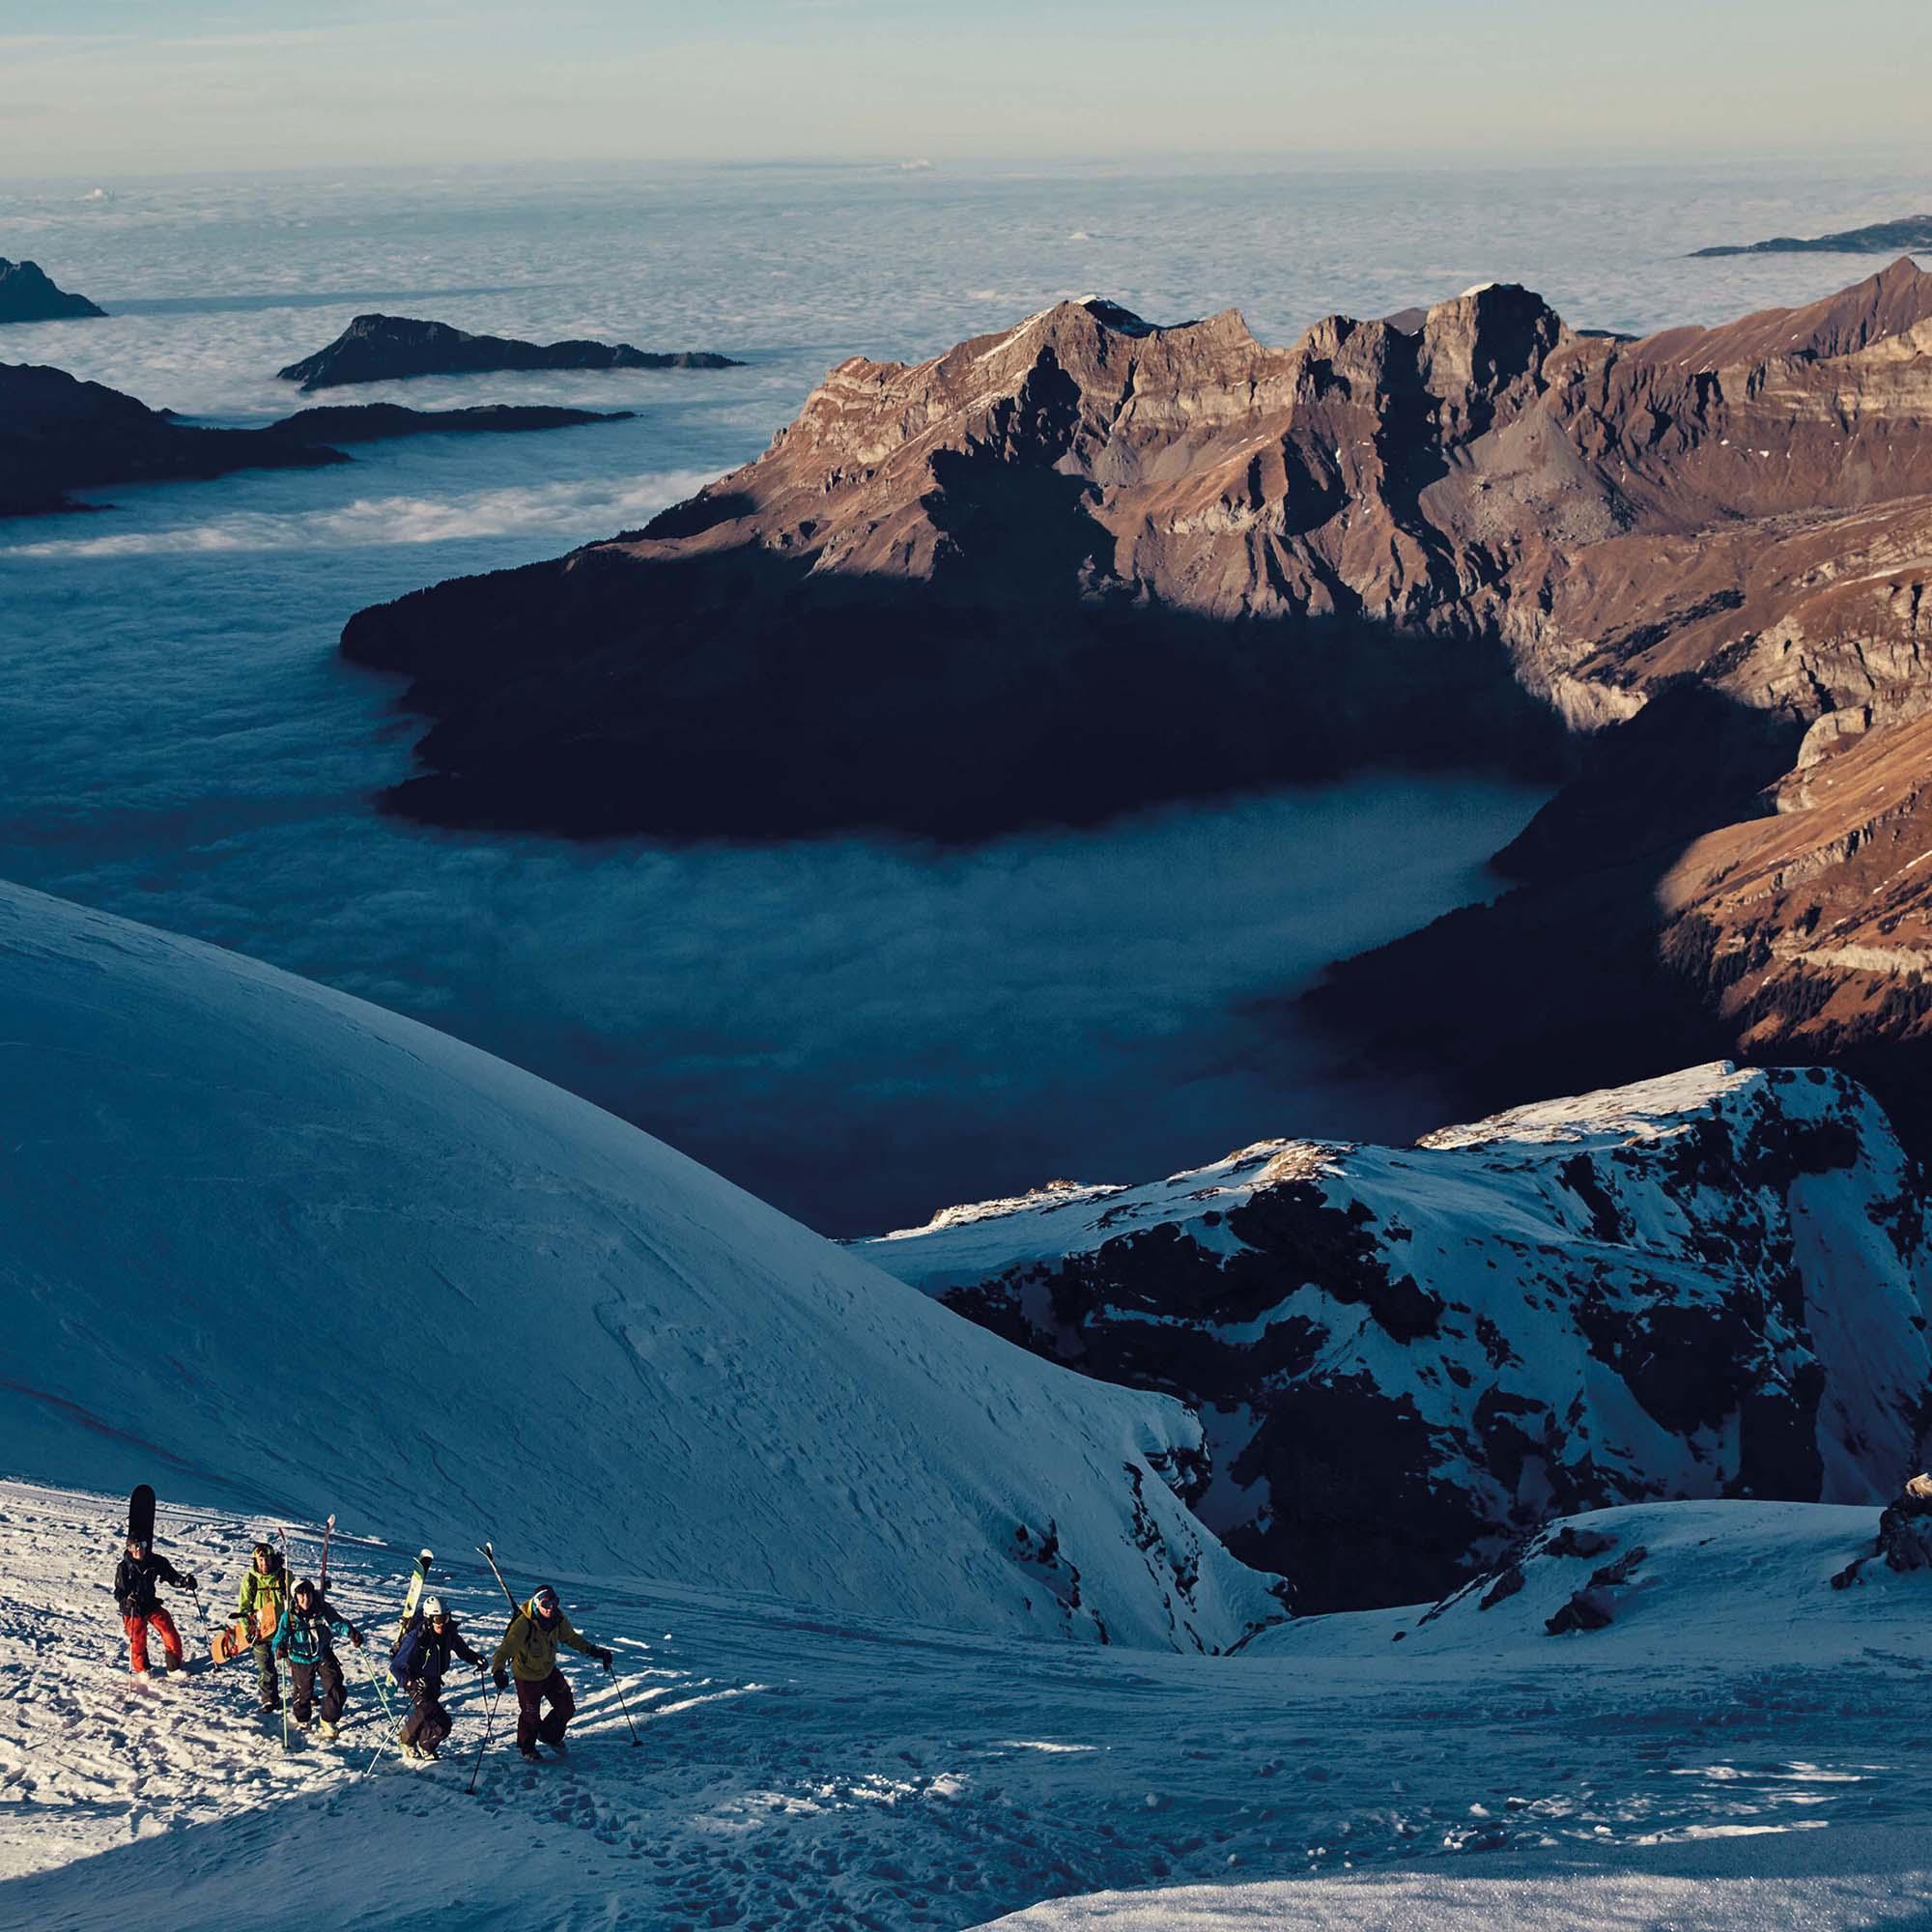 Skitour Gross Titlis